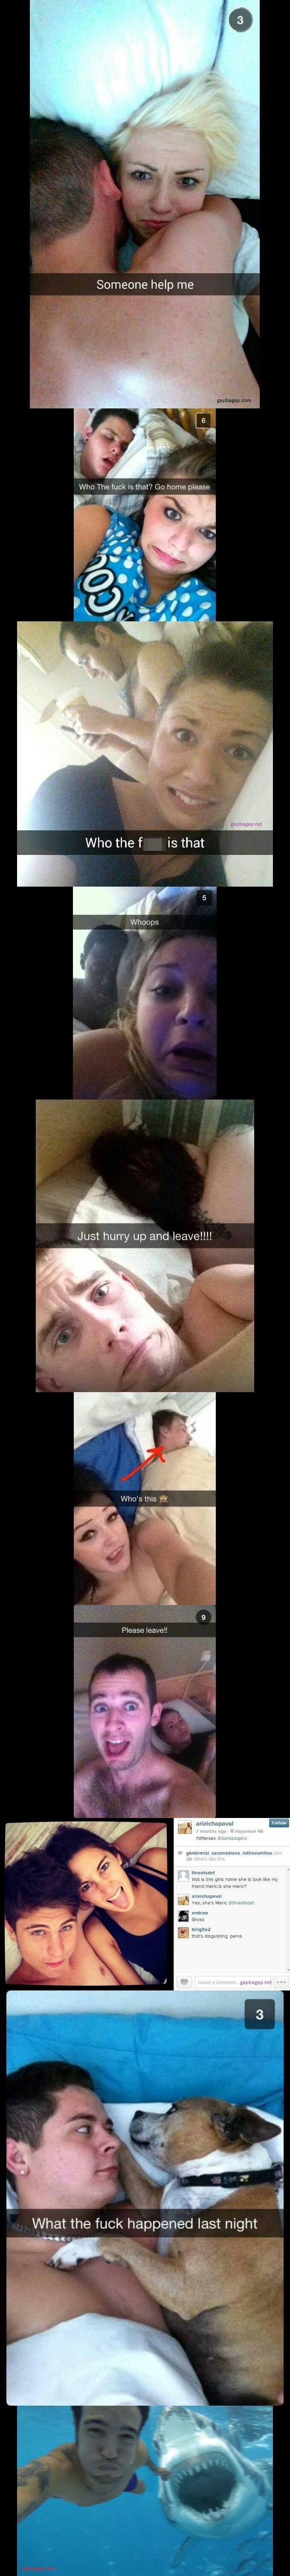 Top 10 Funniest After Sex Selfies